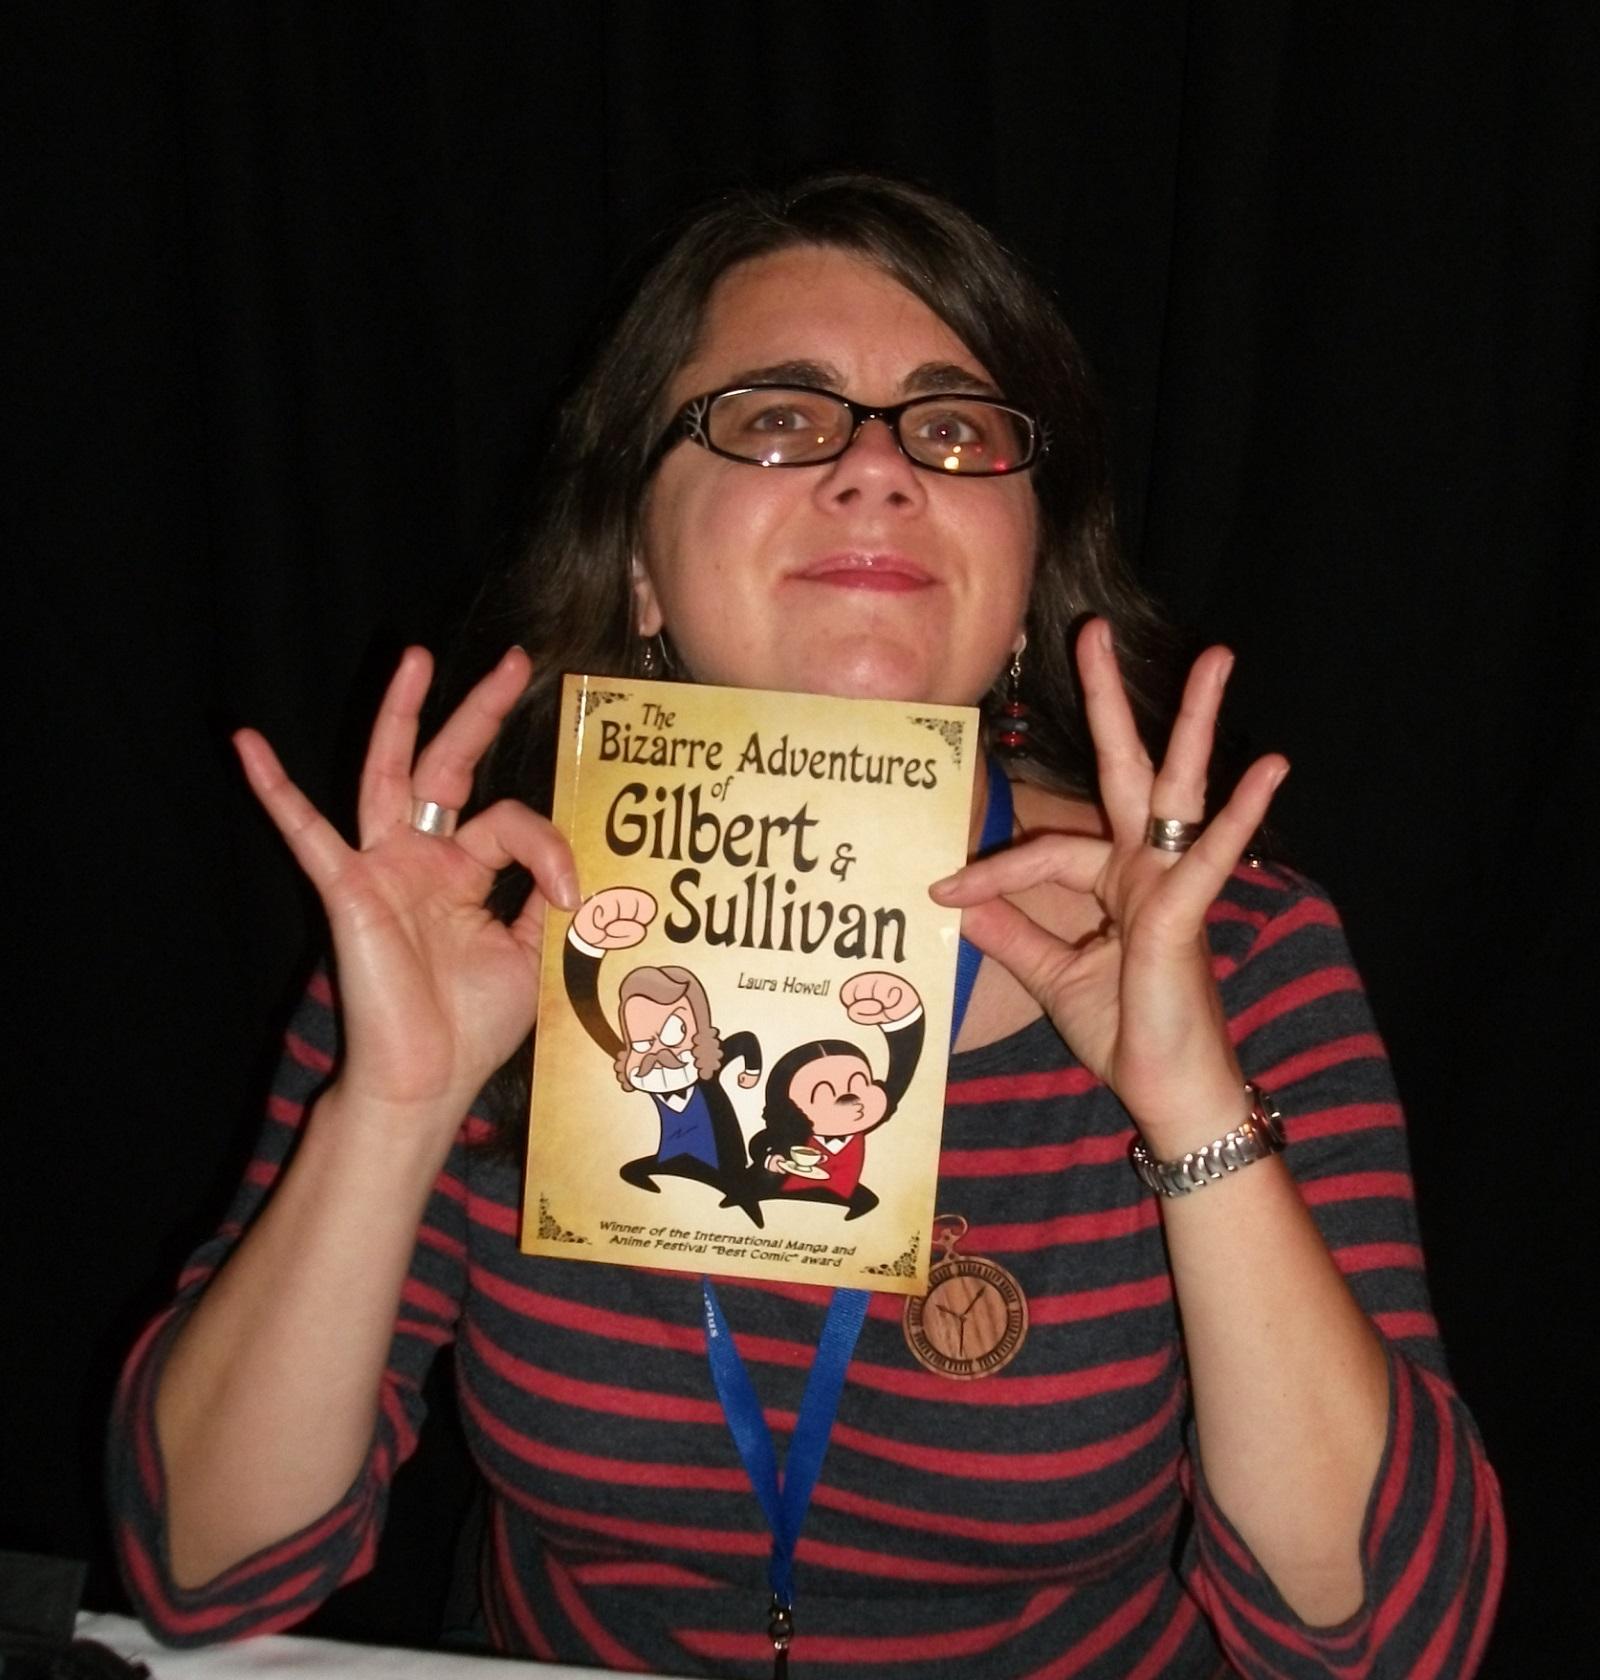 Laura Howell at last year's Lakes International Comic Art Festival.